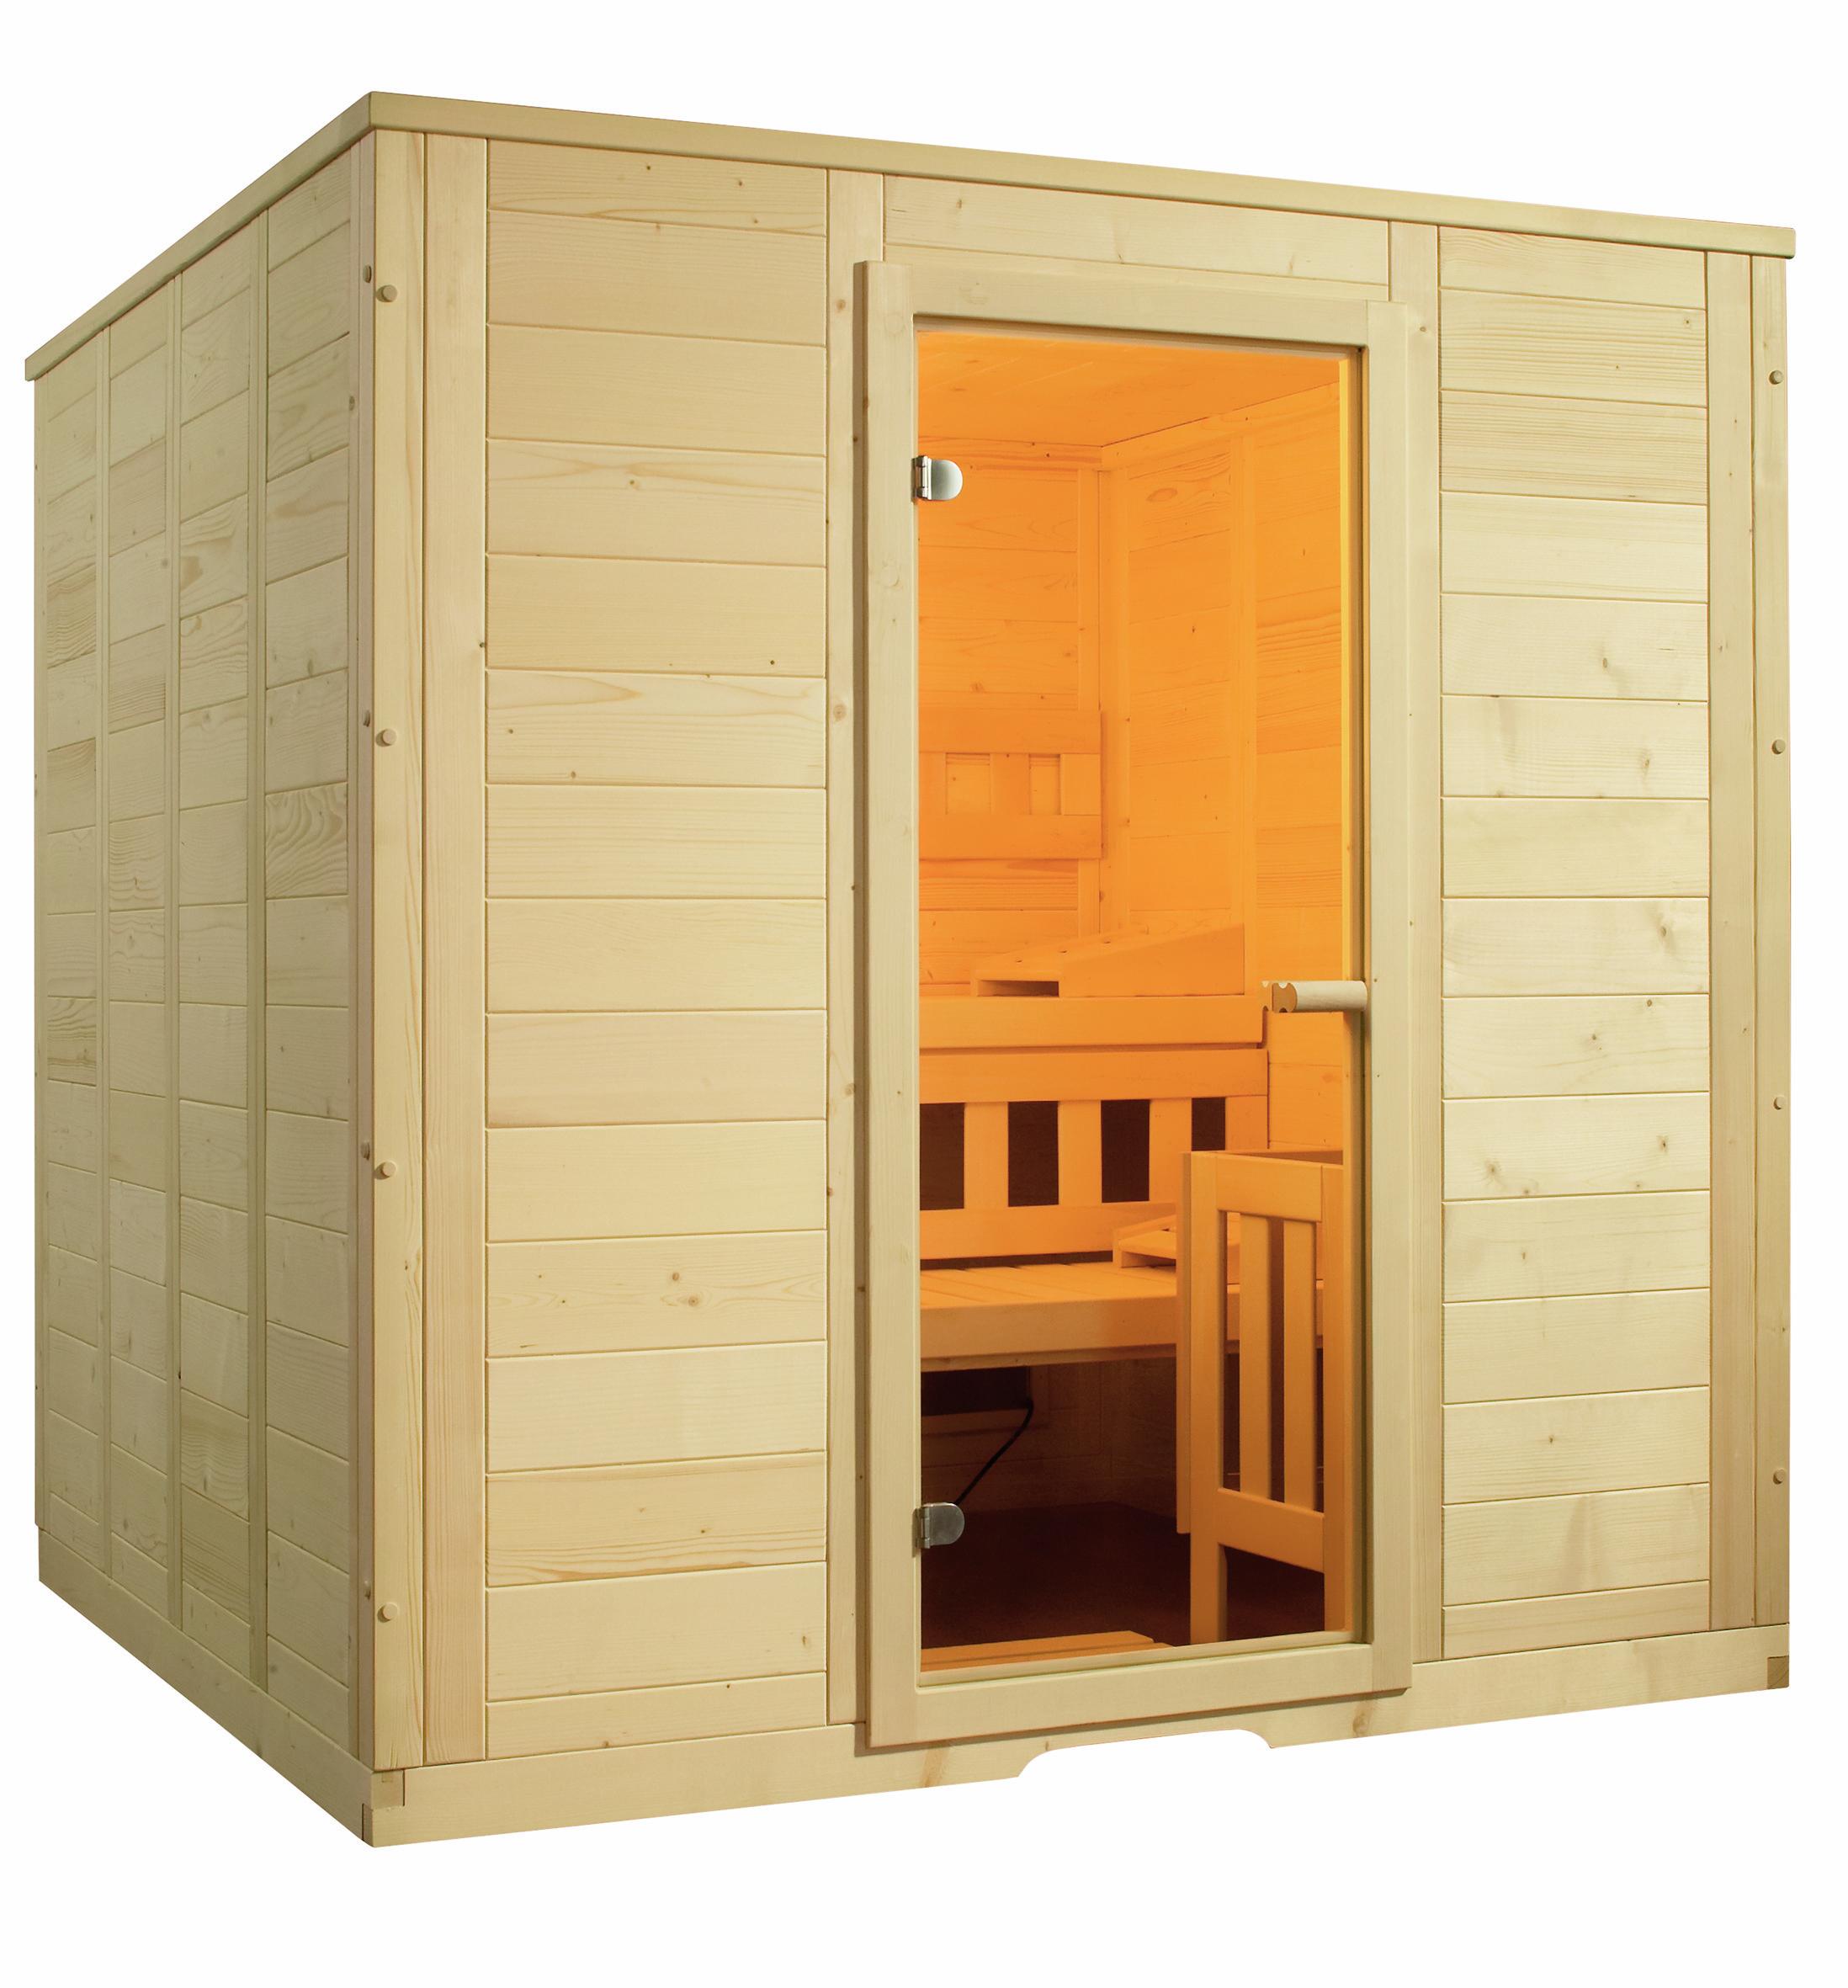 massivholzsauna wellfun large 205 2x206 4x204 cm 3 personen massivholzsaunen sauna sauna. Black Bedroom Furniture Sets. Home Design Ideas